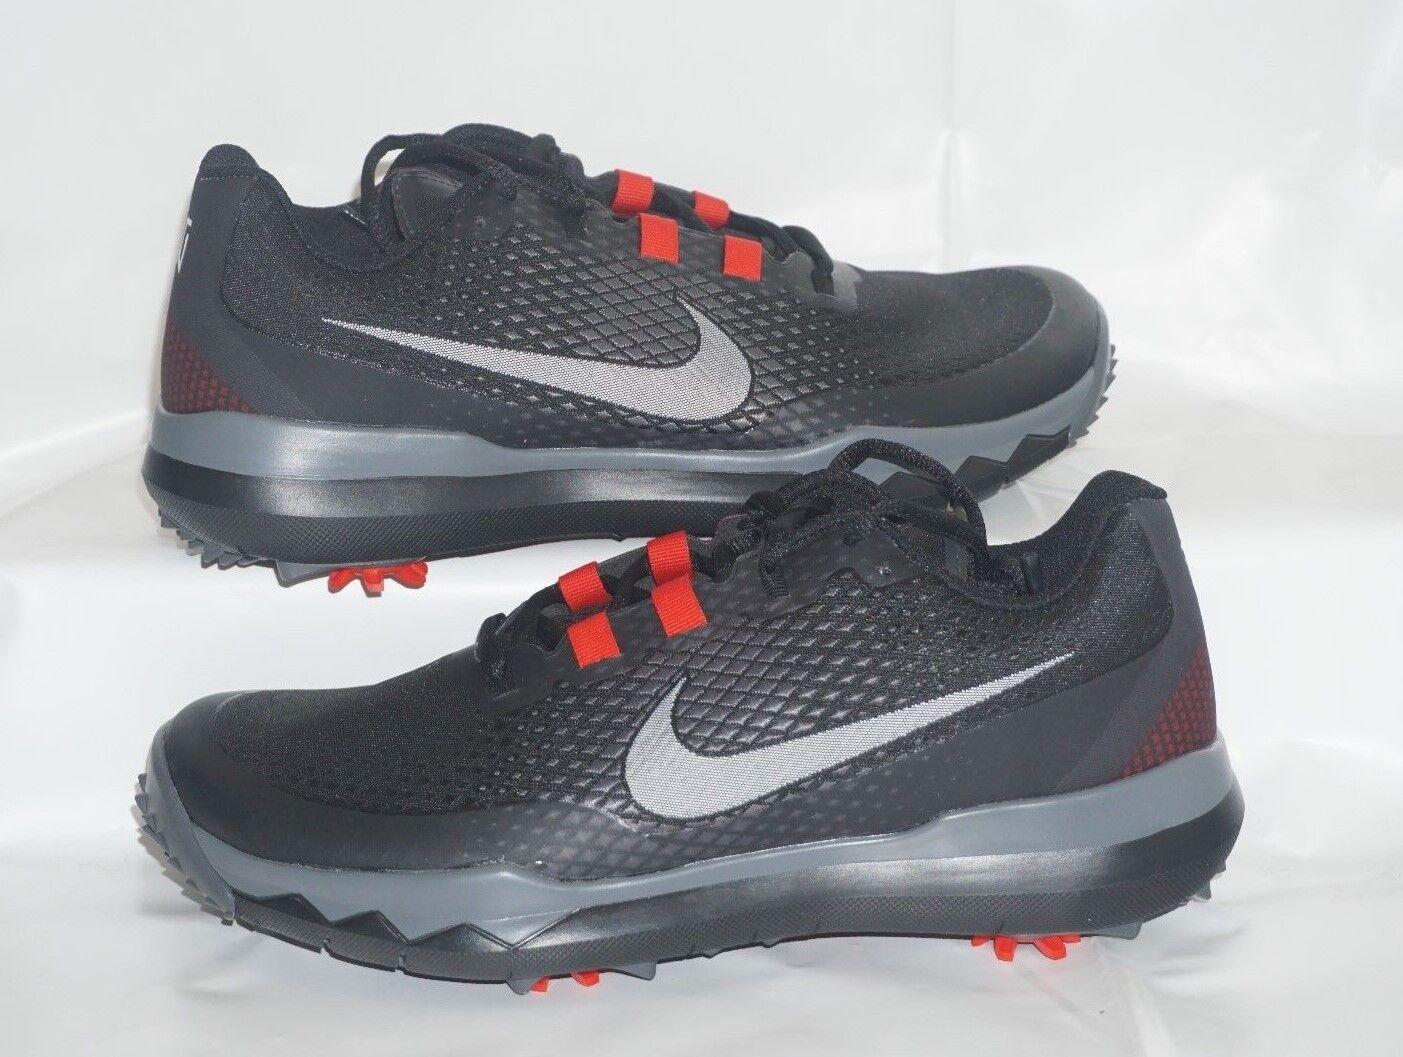 Men's Nike WOODS NIKE TW 15 TIGER WOODS Nike Golf Shoes - Size 8 US 6743c0